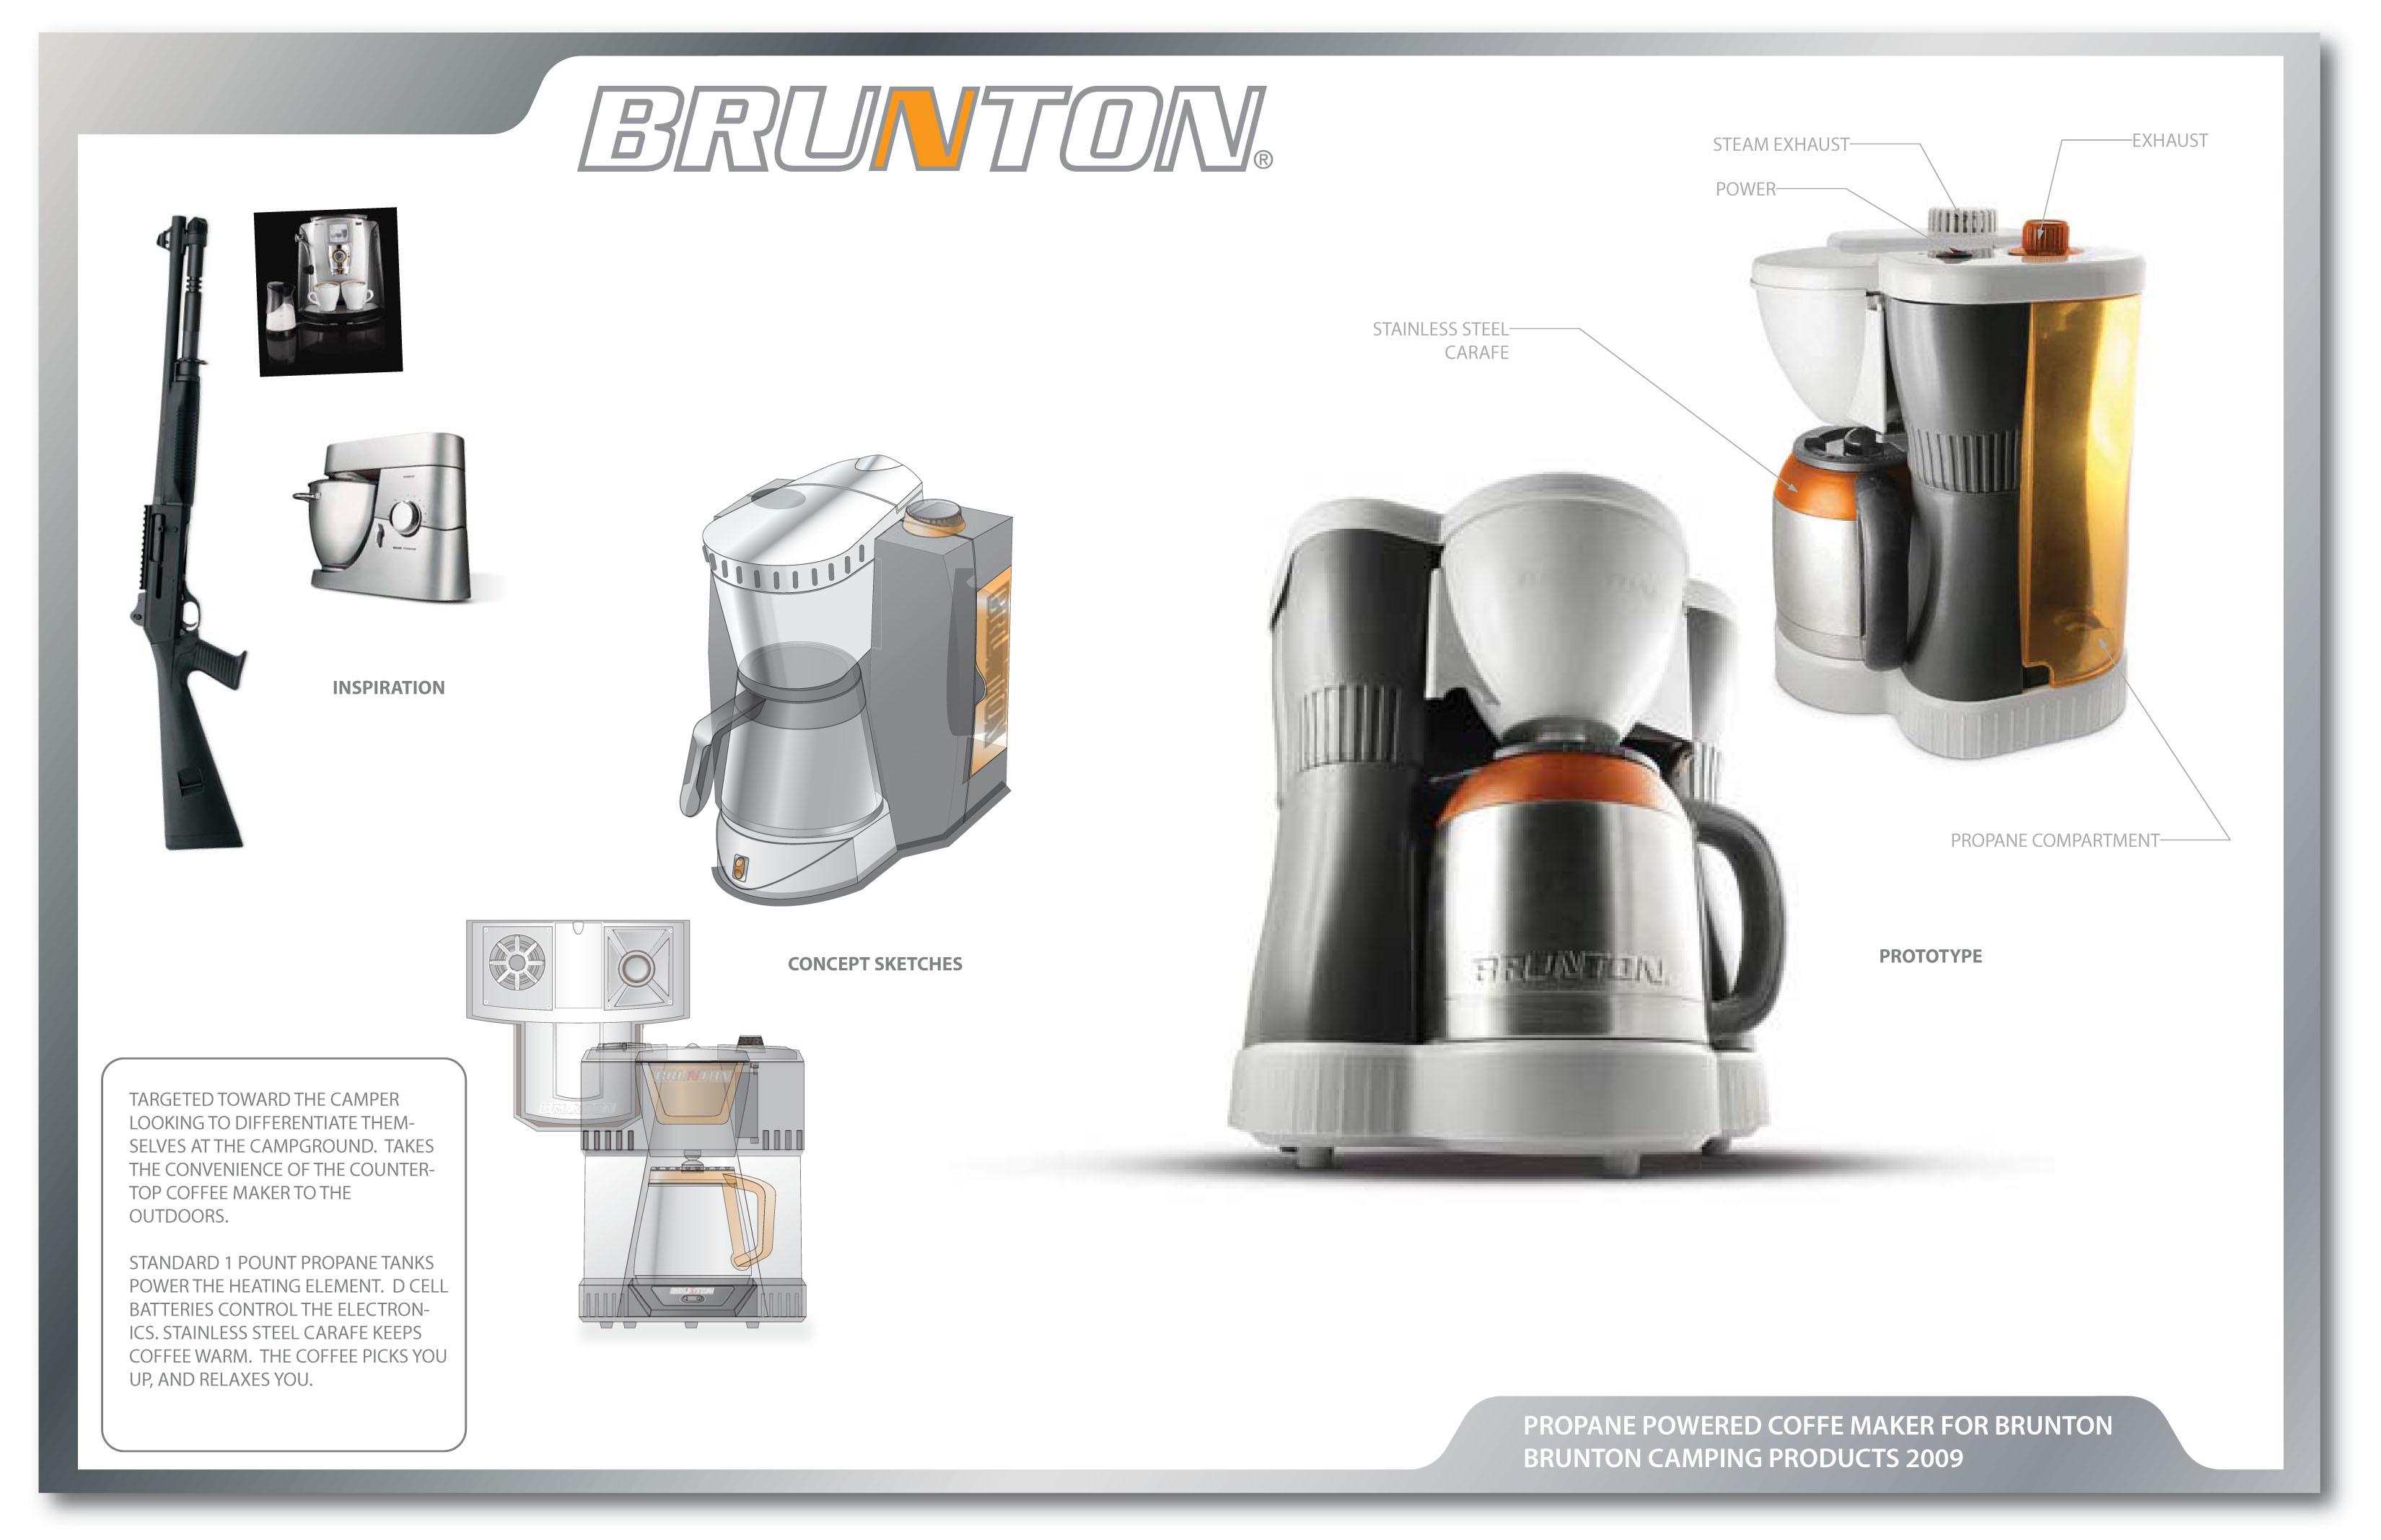 Brunton and Gerber Gear by Juan Cagampang at Coroflot.com